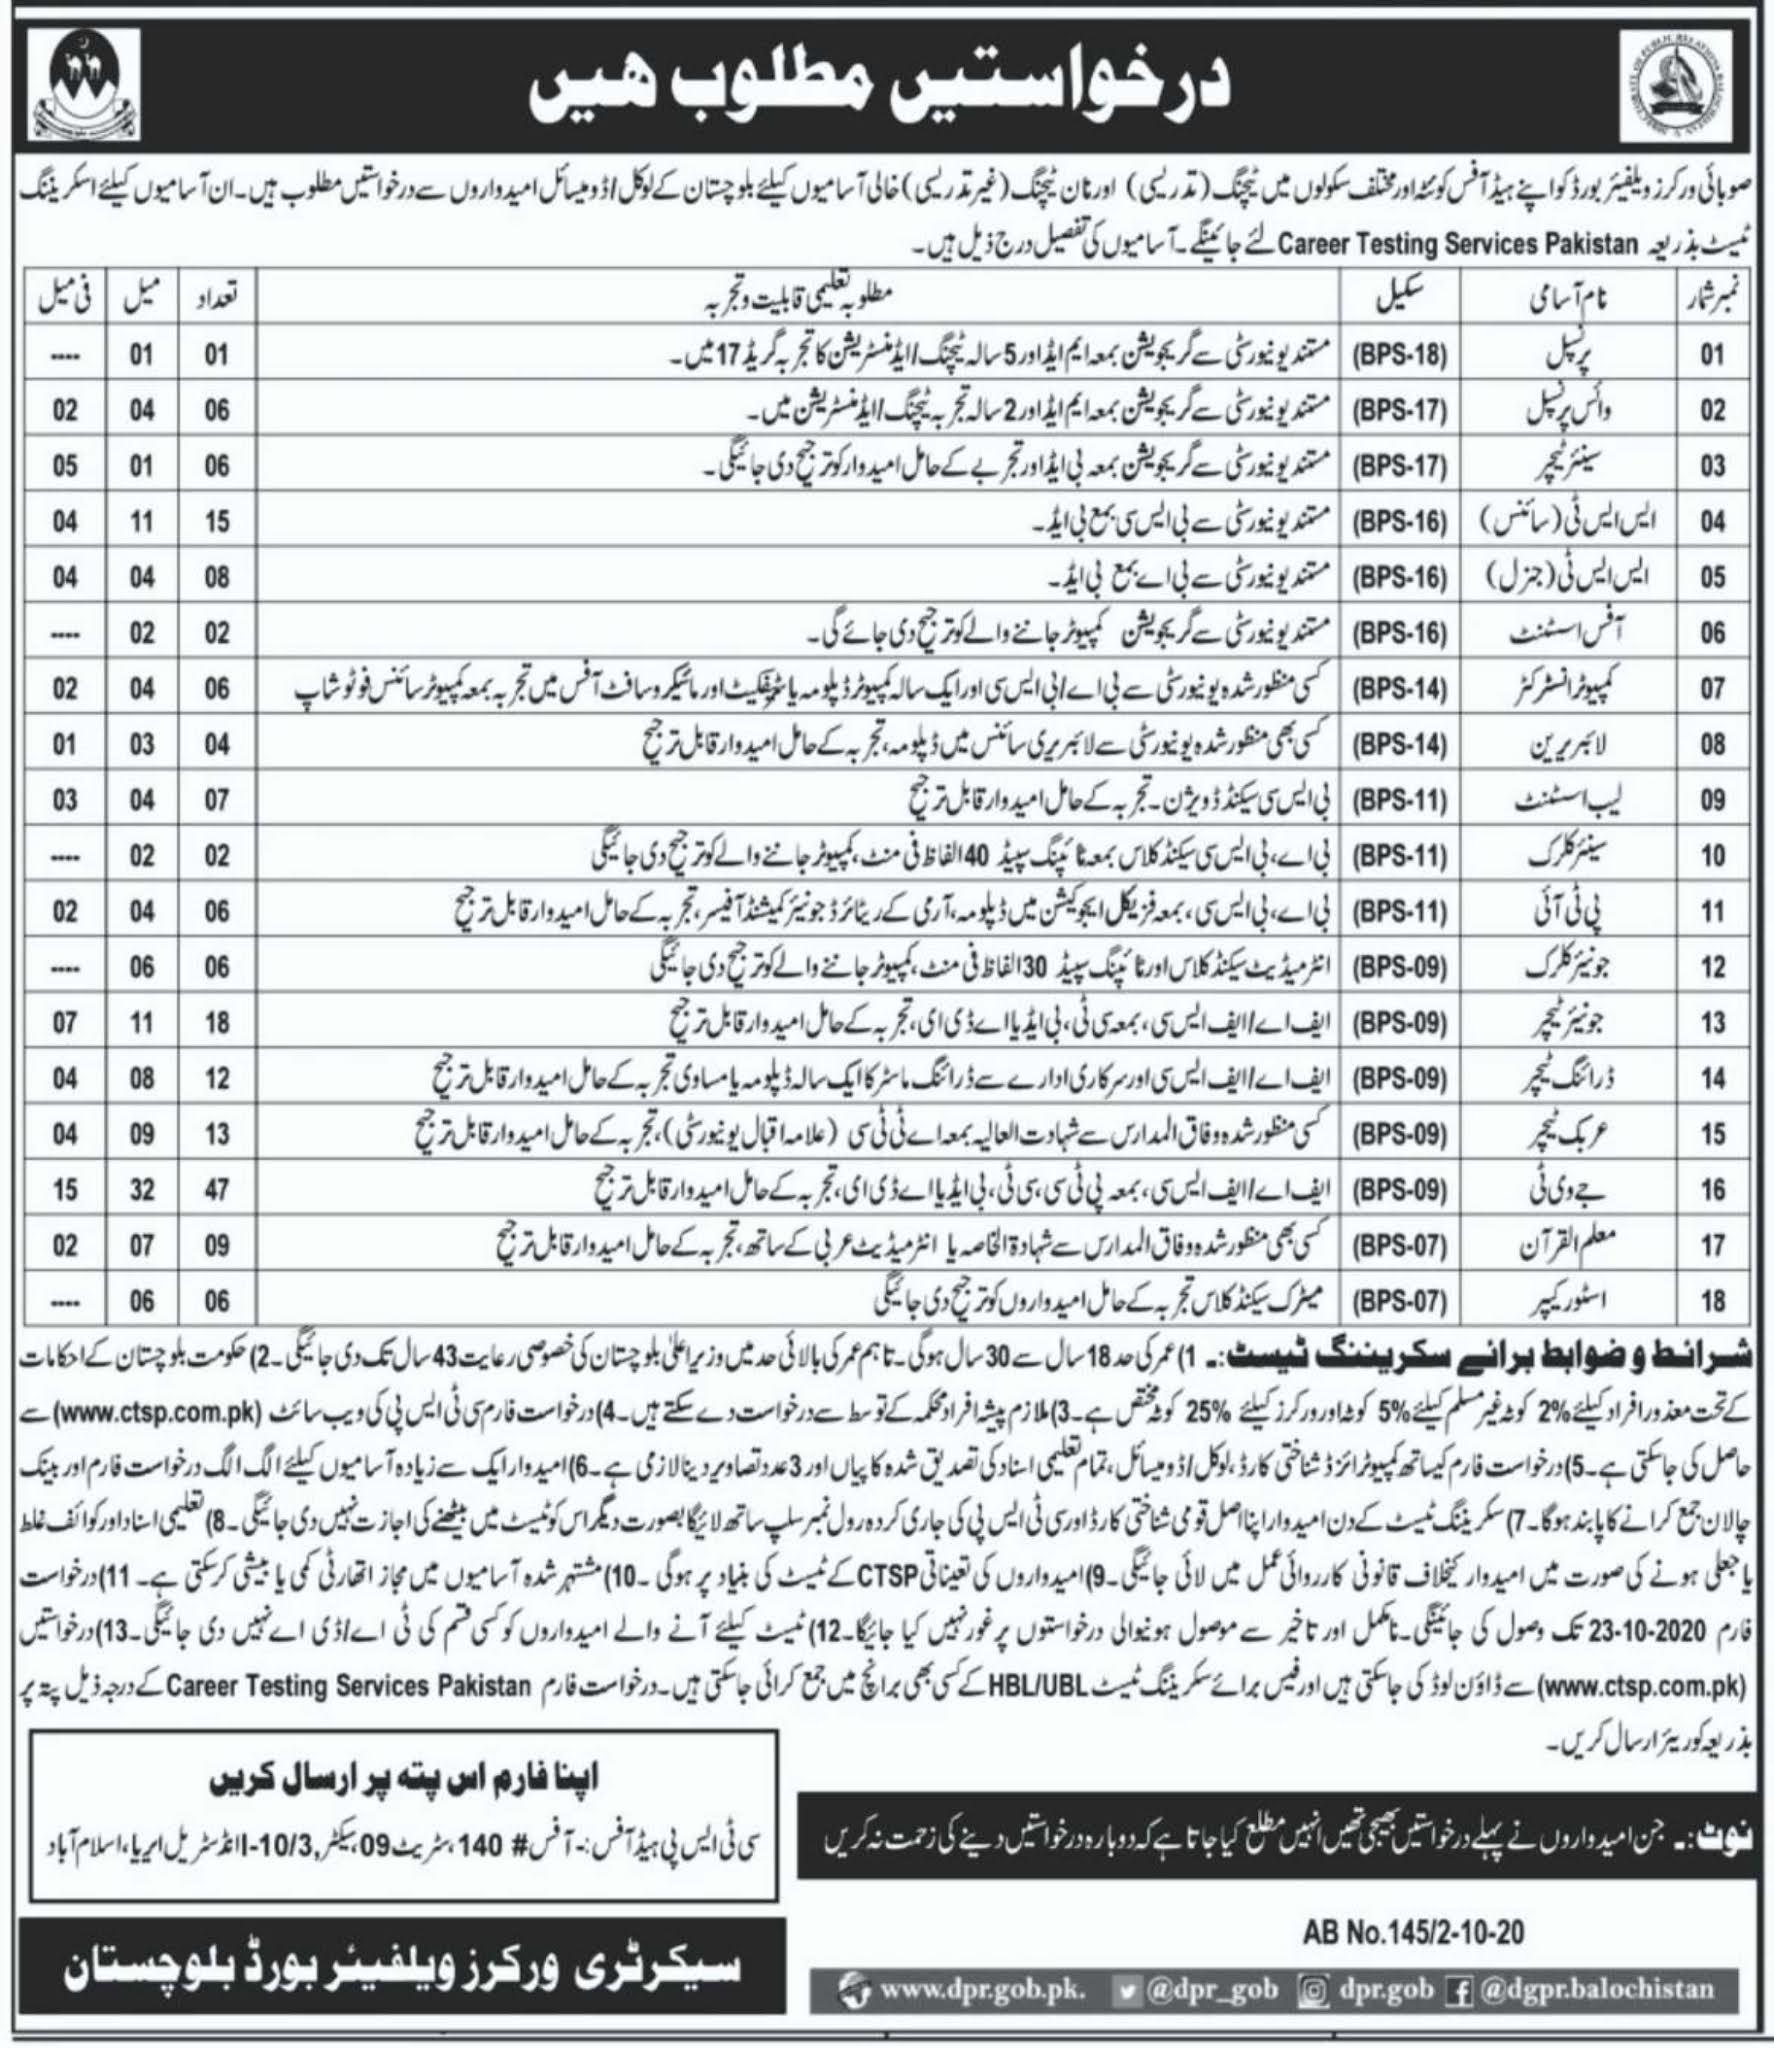 Workers Welfare Board Balochistan CTSP Jobs 2021 Application Form Roll No Slips